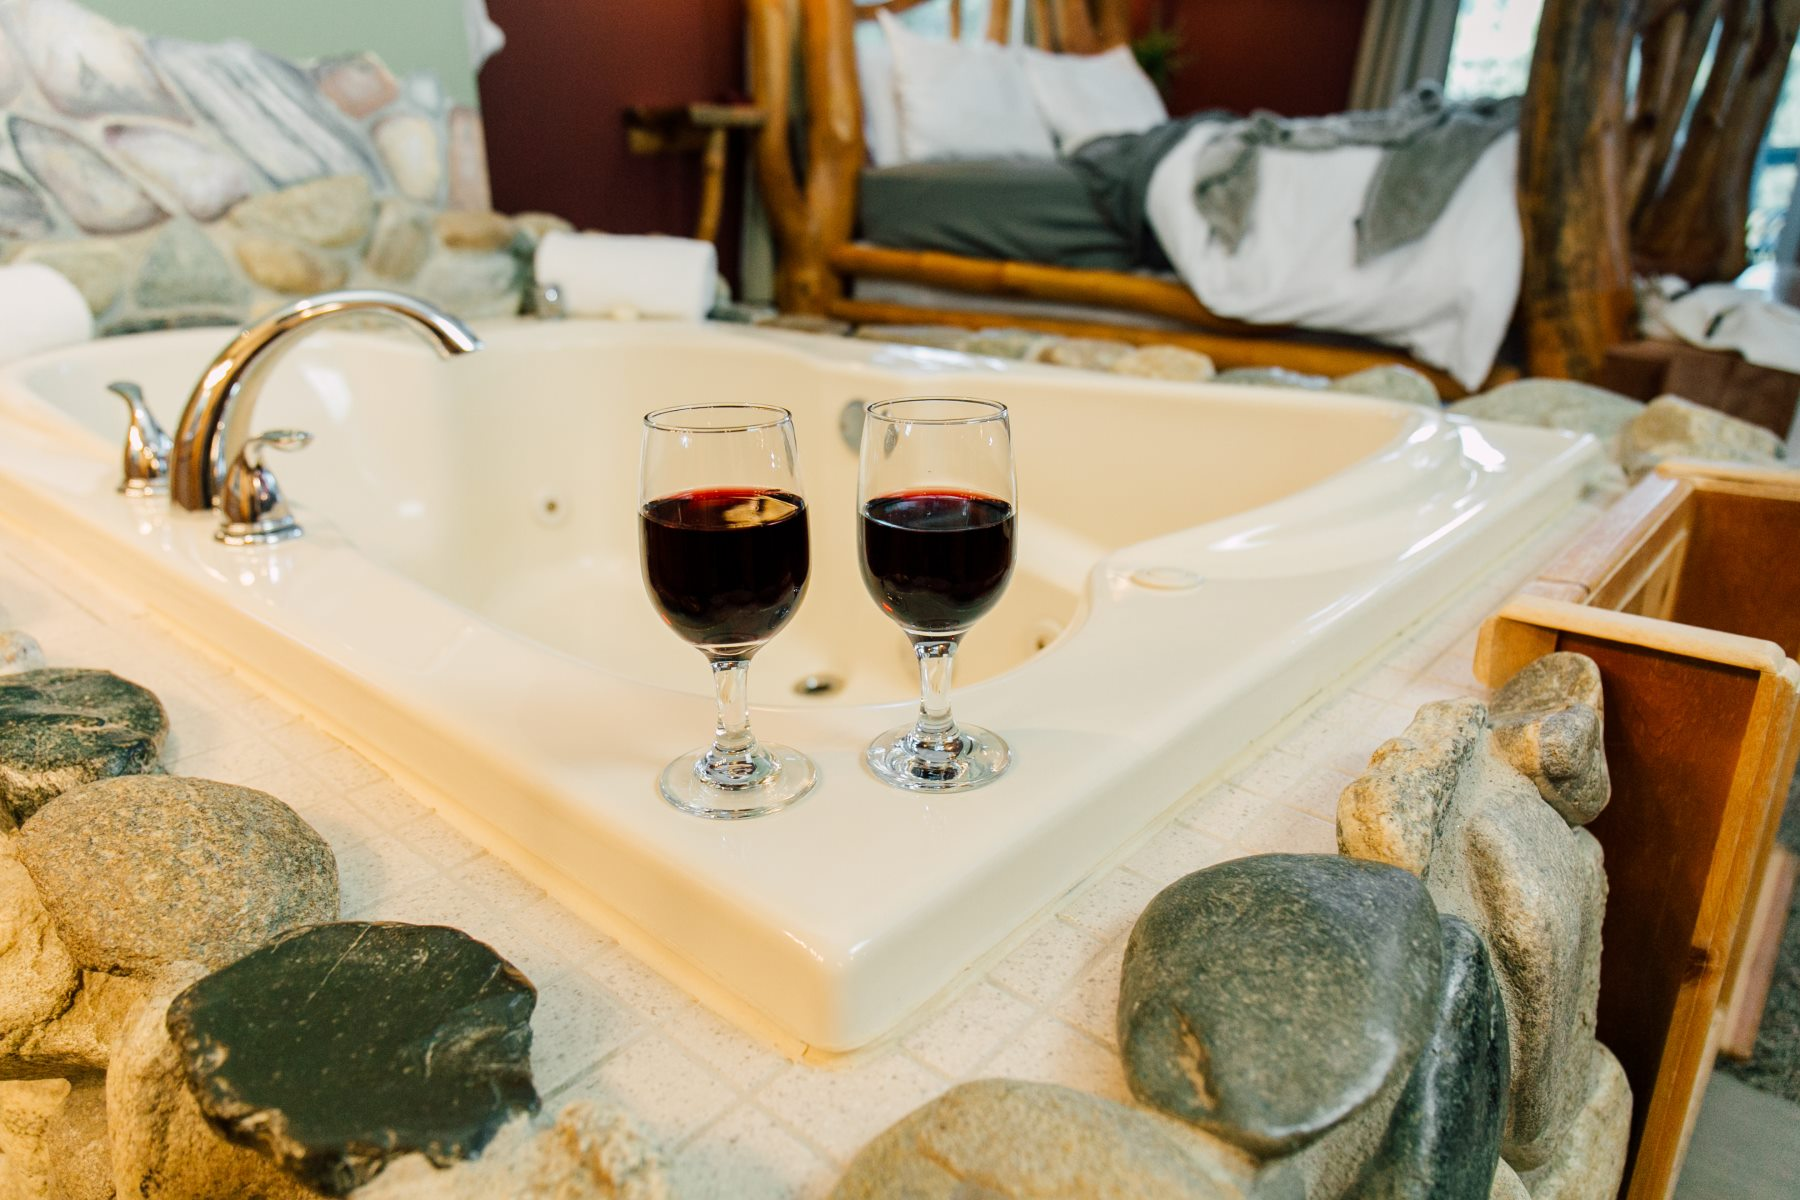 nason suite tub with wine glasses